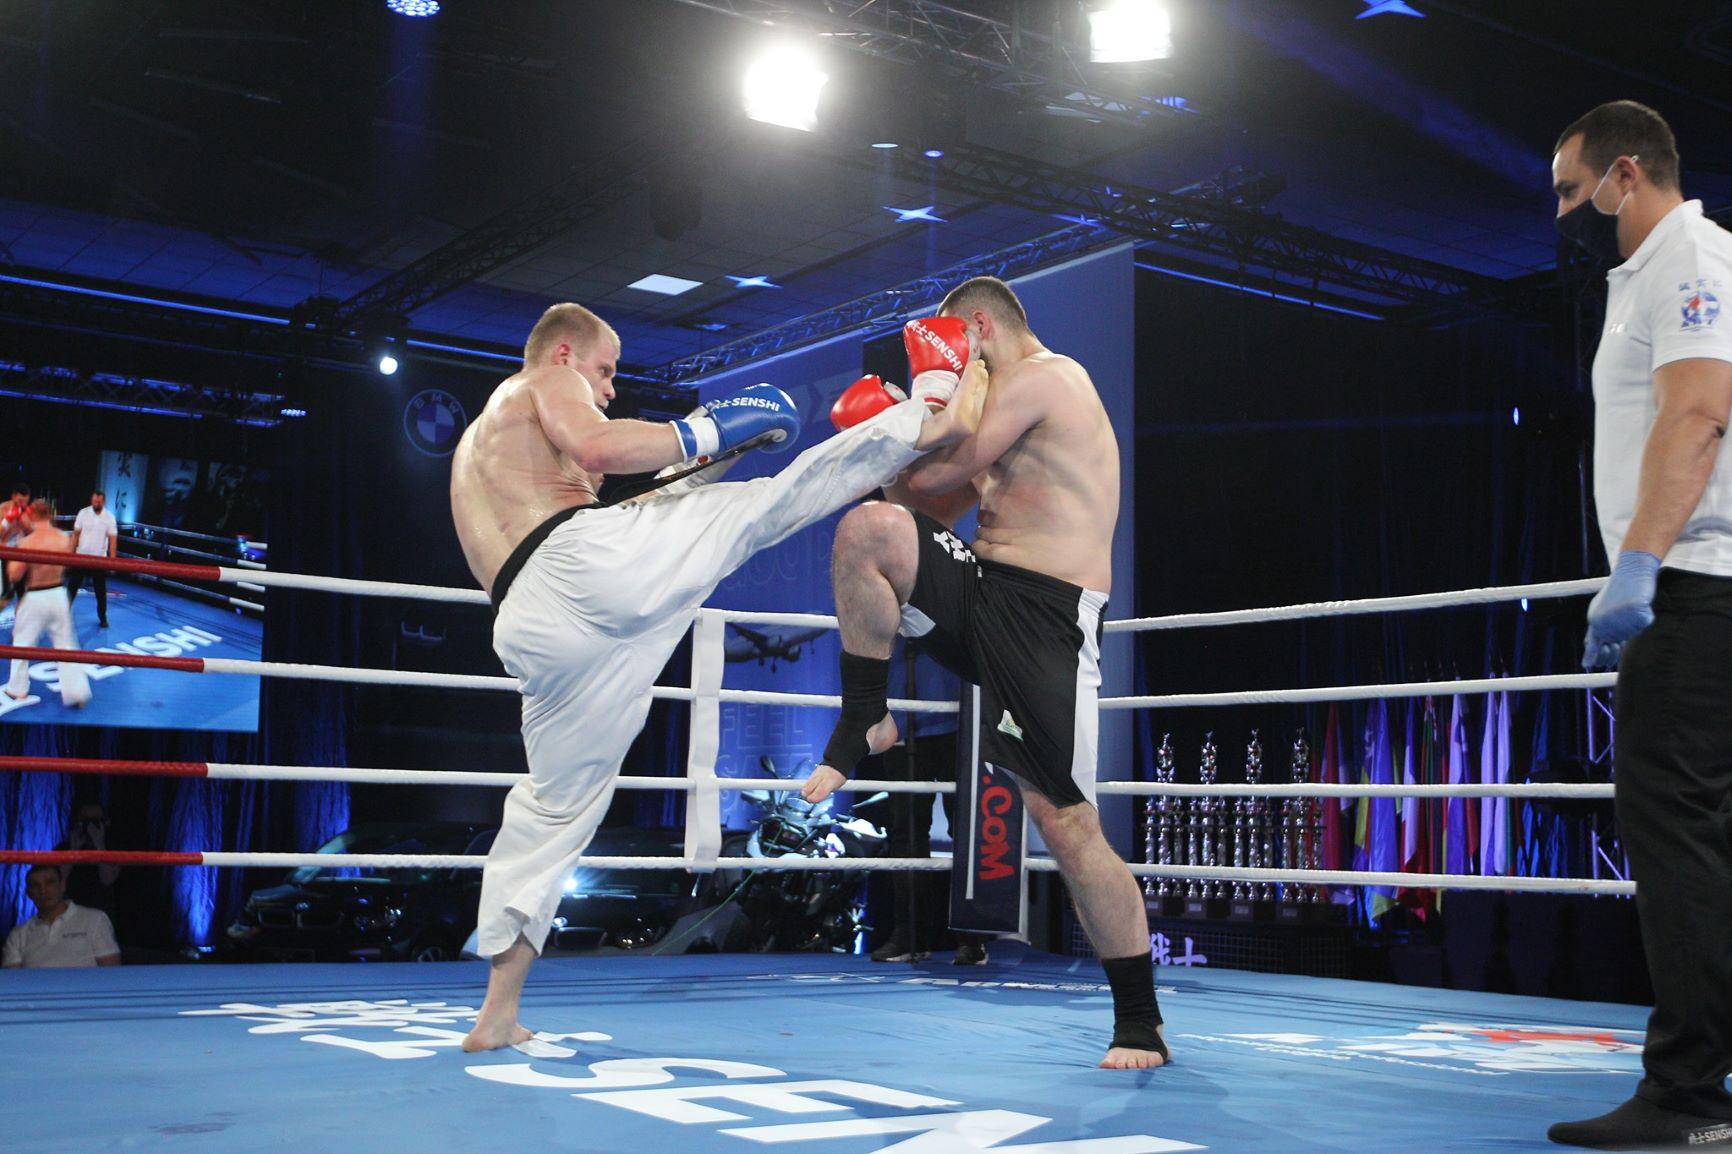 SENSHI 7: Ахмед Кърнич срещу Виталий Ишахнели (ВИДЕО)